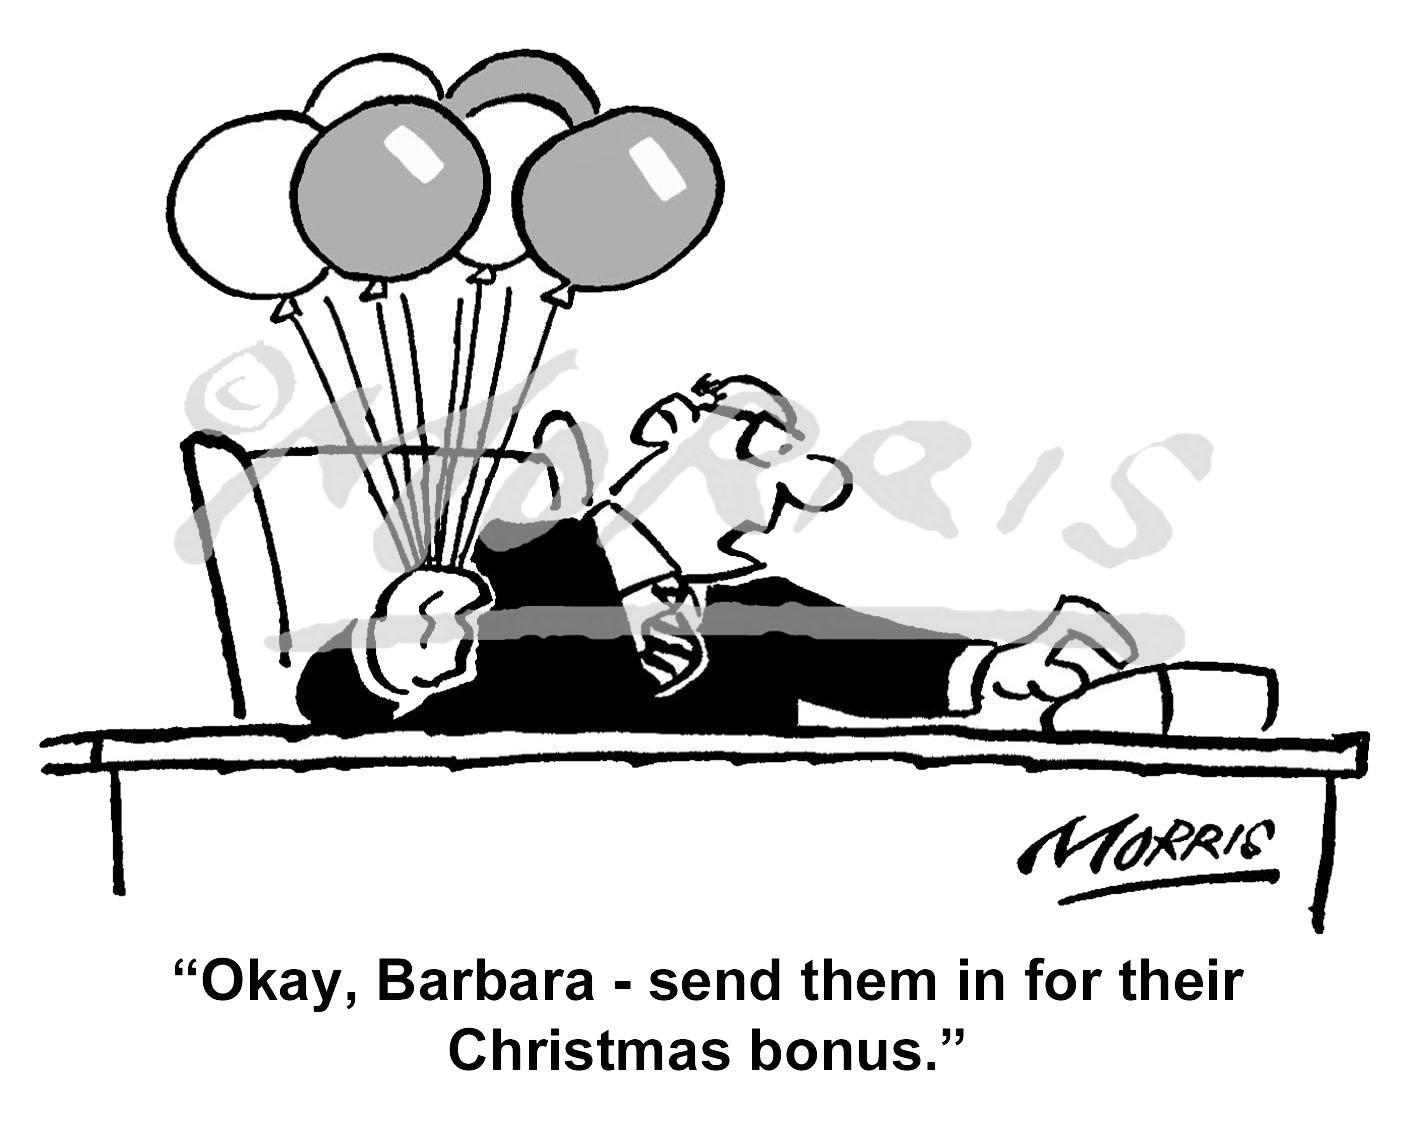 Employees Christmas bonus cartoon: Ref: 1258bw